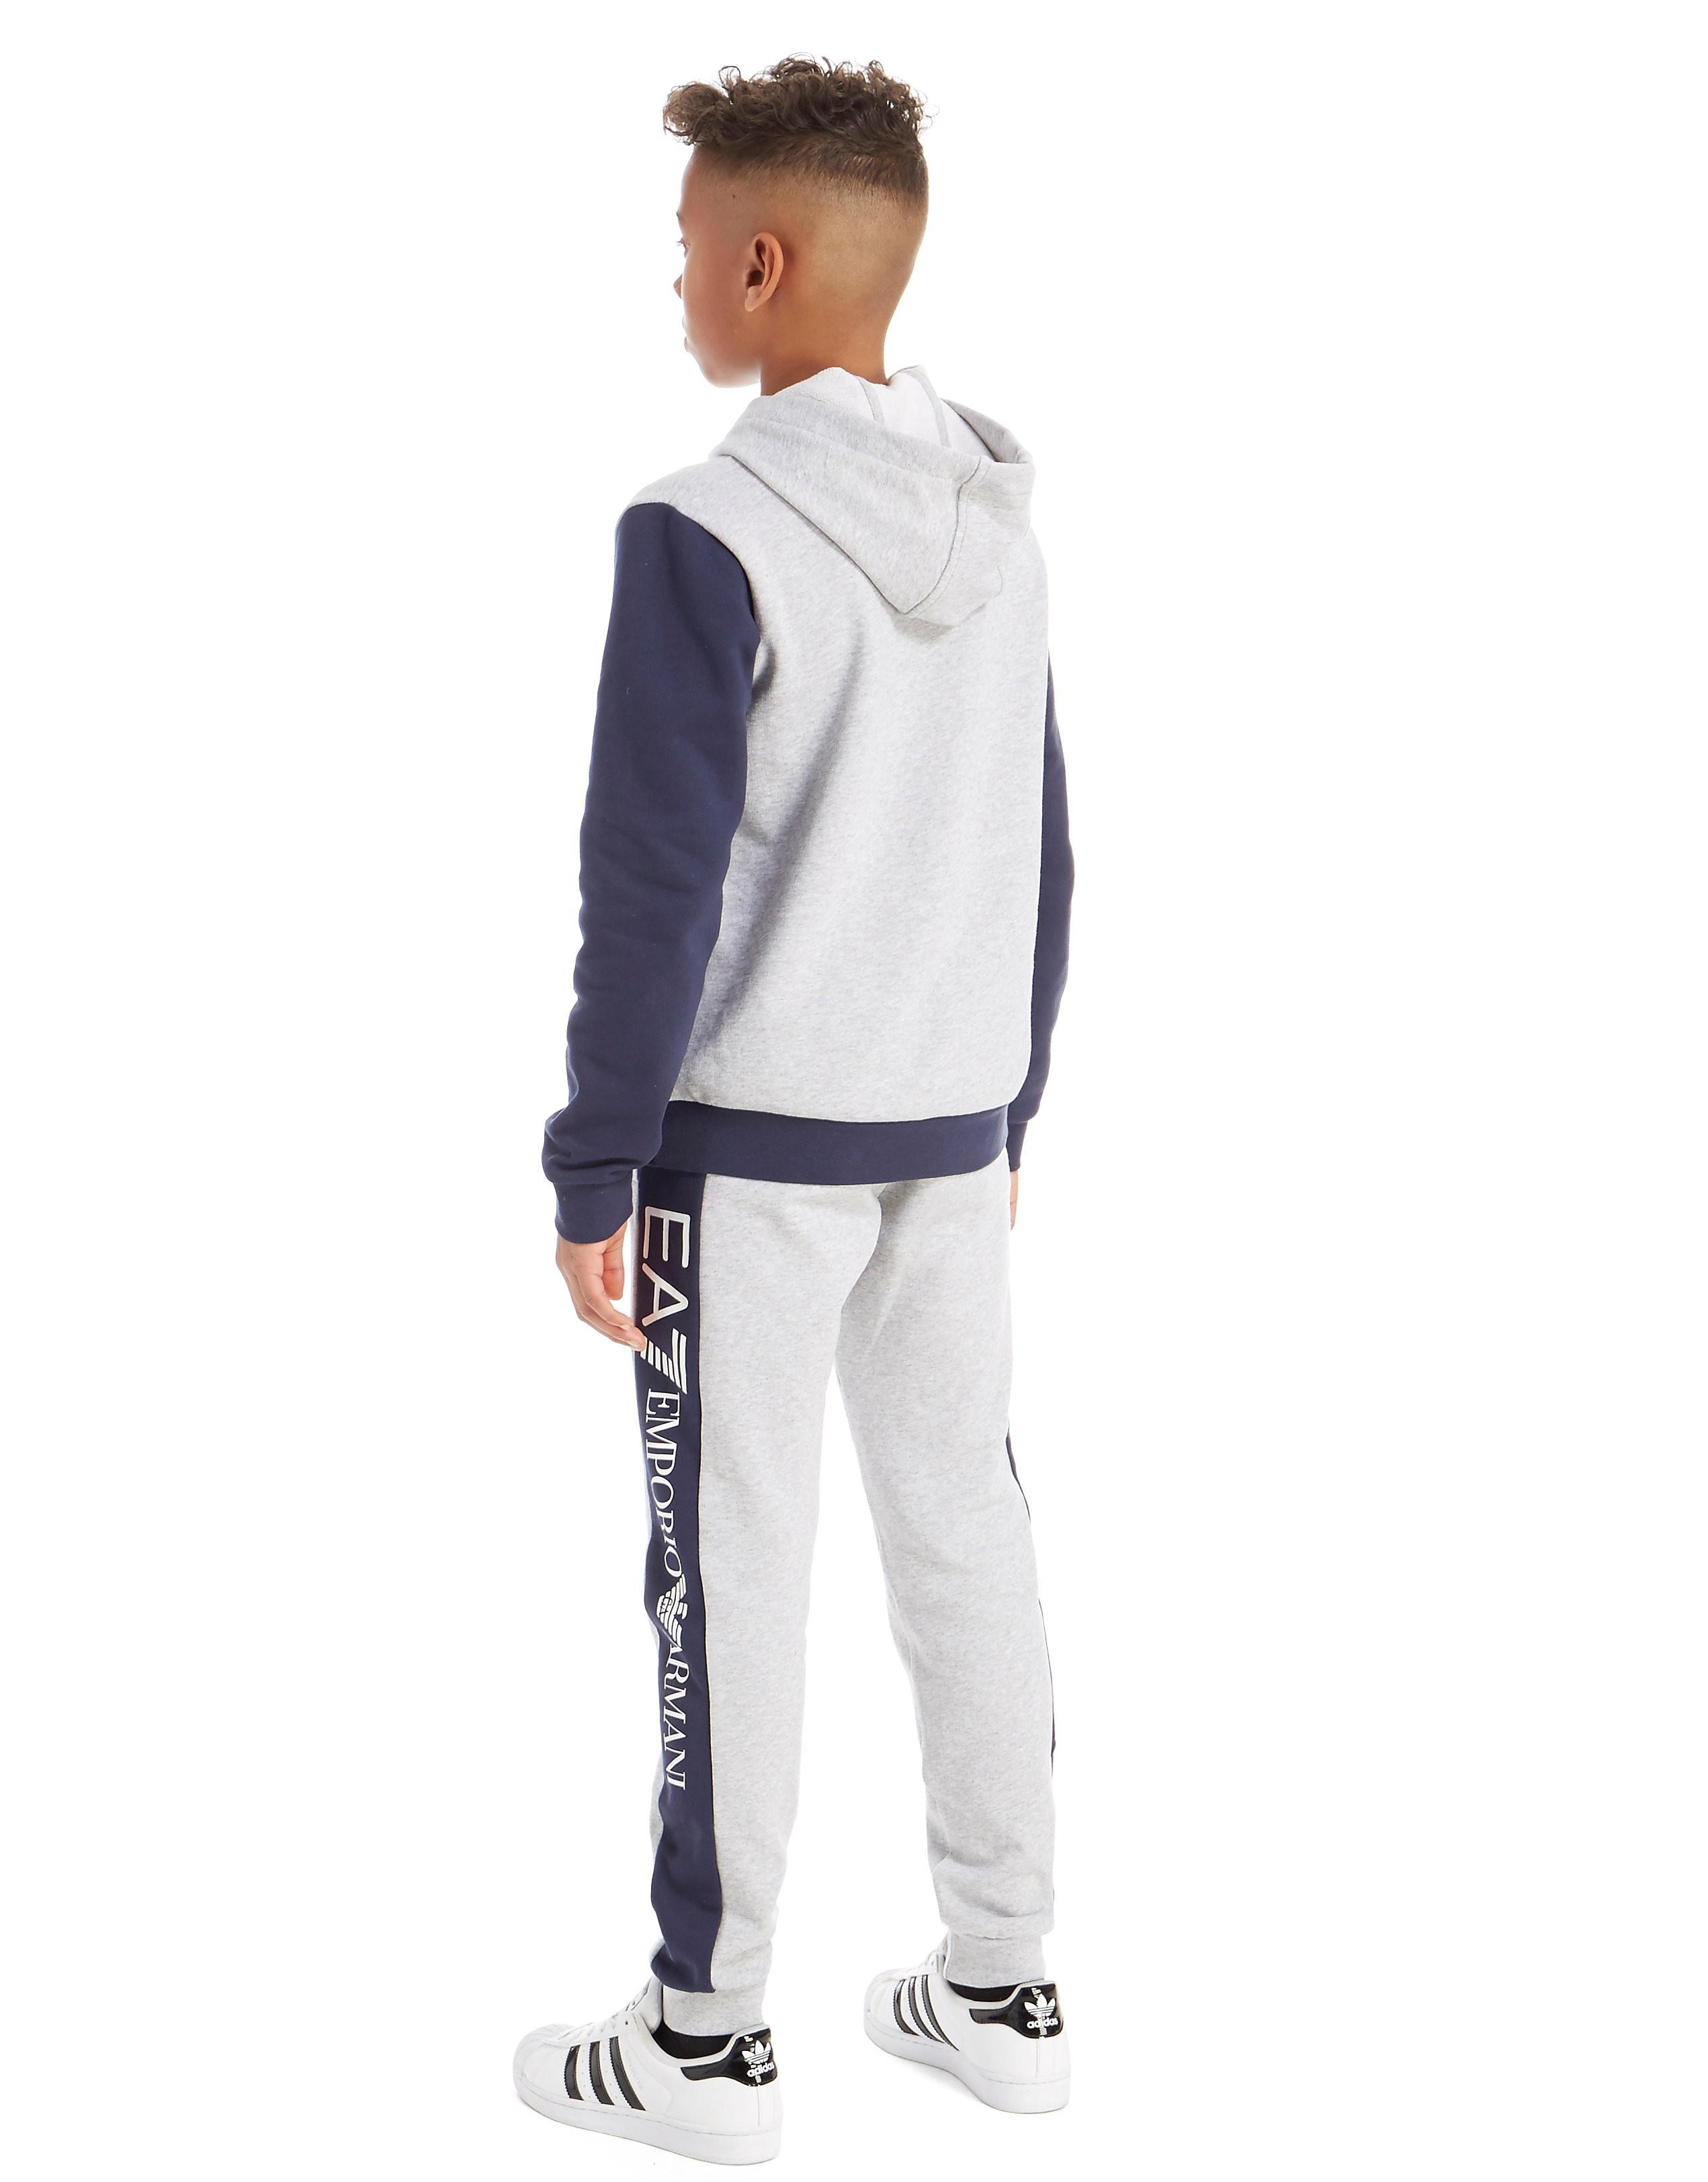 Emporio Armani EA7 Survêtement Colourblock Fleece Junior